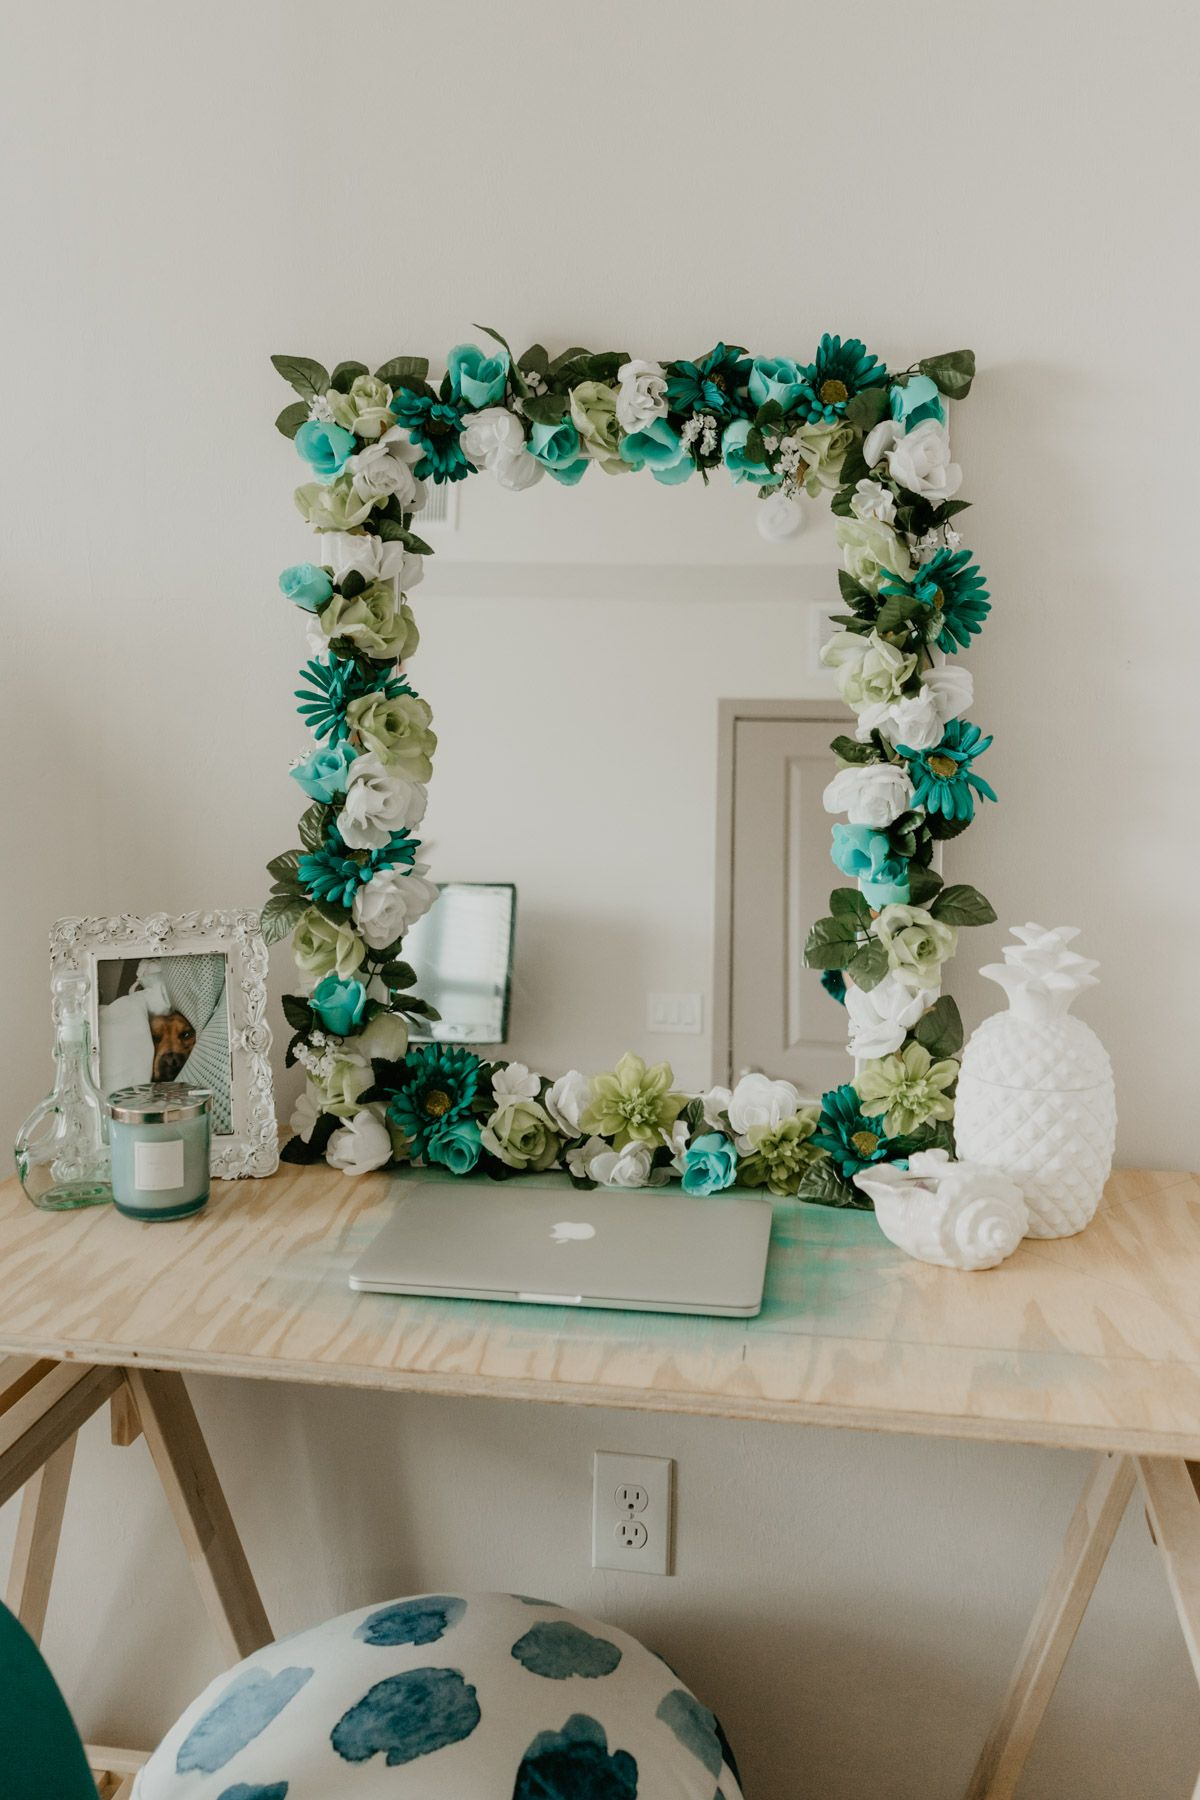 Diy flower mirror diy flower mirror flower mirror